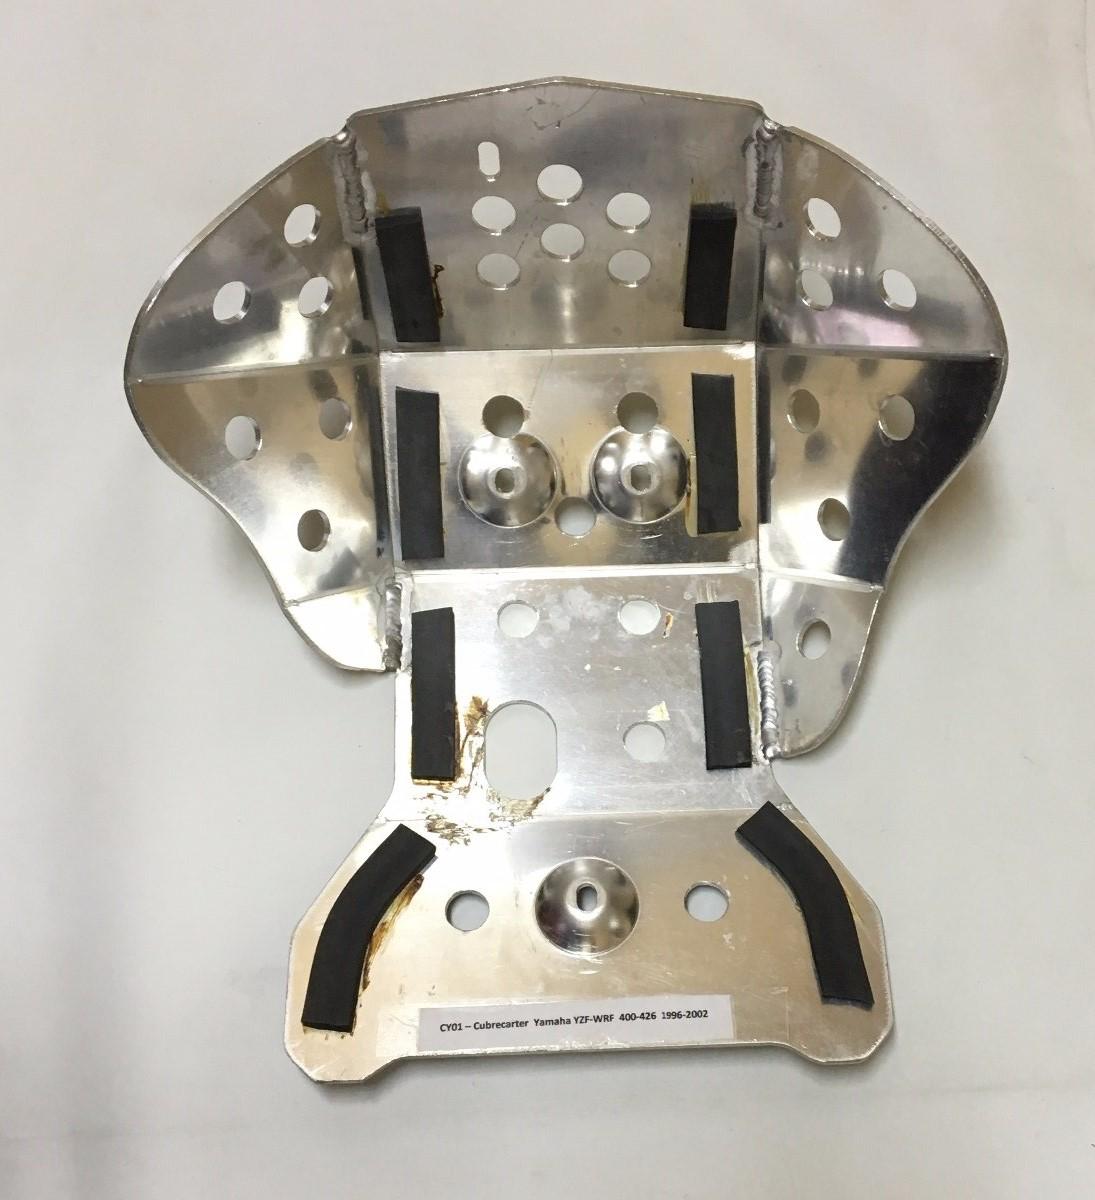 cubre carter Yamaha YZF WRF 400-426 1996-2002 aluminio